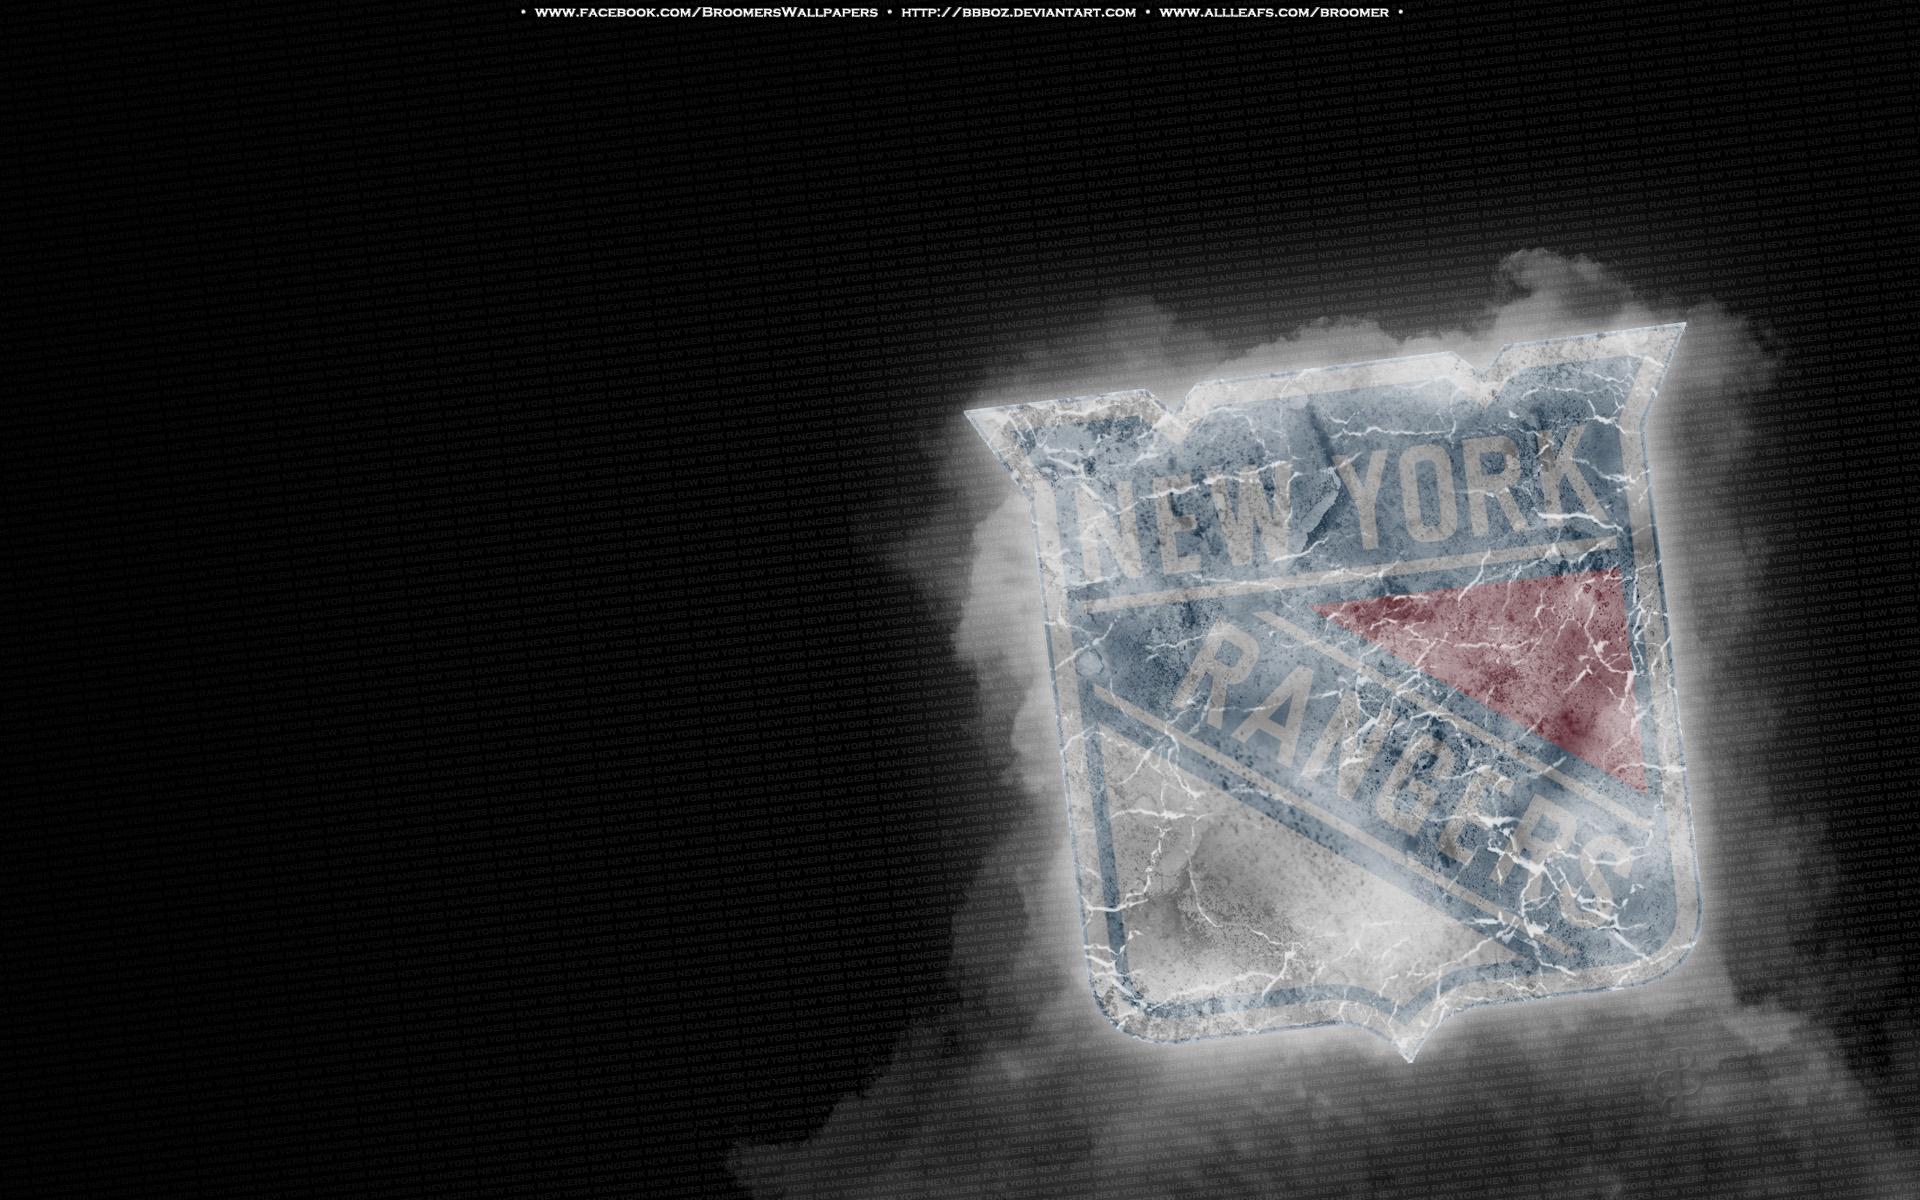 New York Rangers , HD Wallpaper & Backgrounds